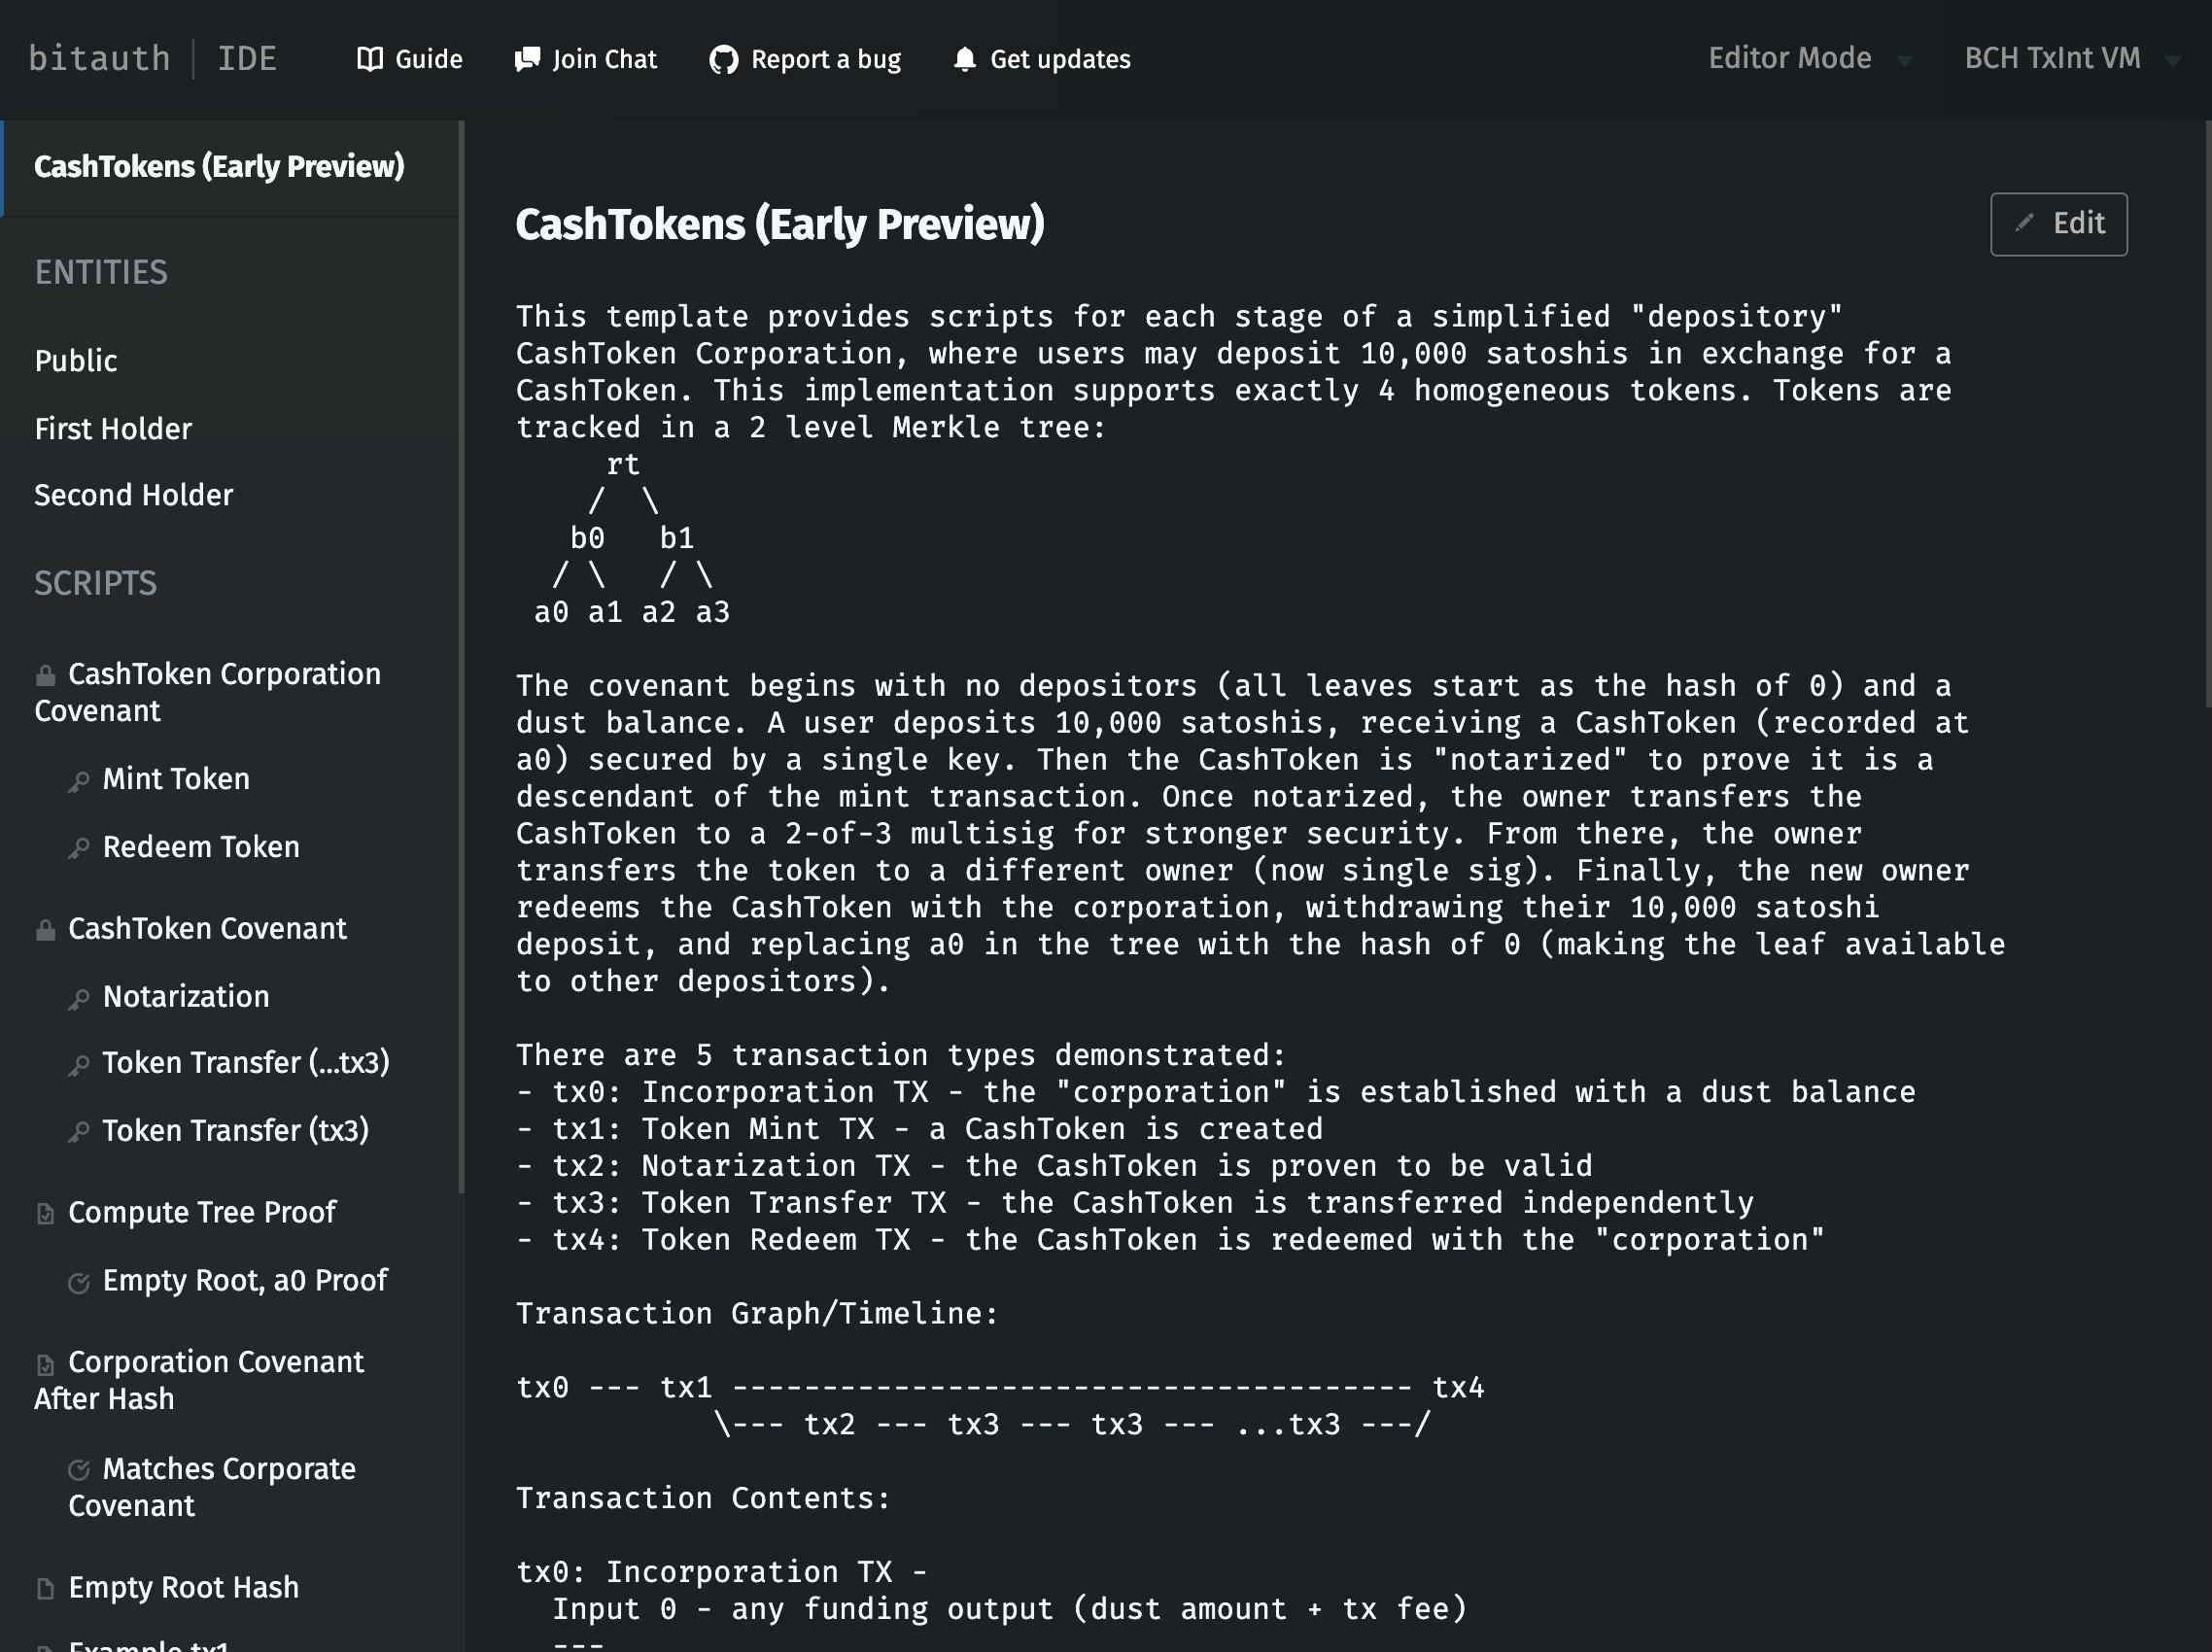 CashTokens template screenshot